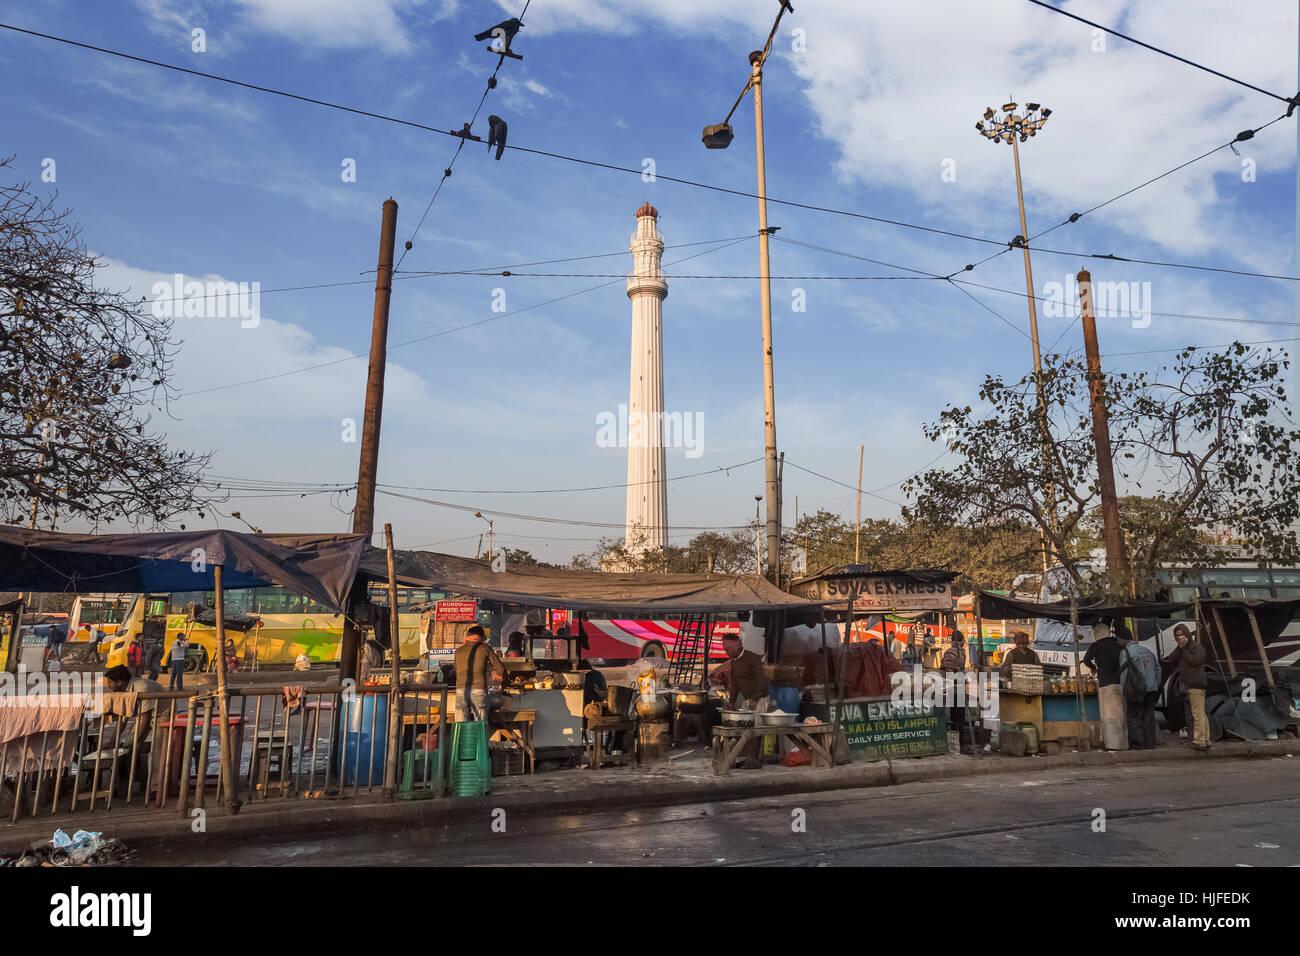 Ochterlony Monument or Shaheed Minar a famous landmark in the city of Kolkata as seen from a street near Chowringhee, - Stock Image